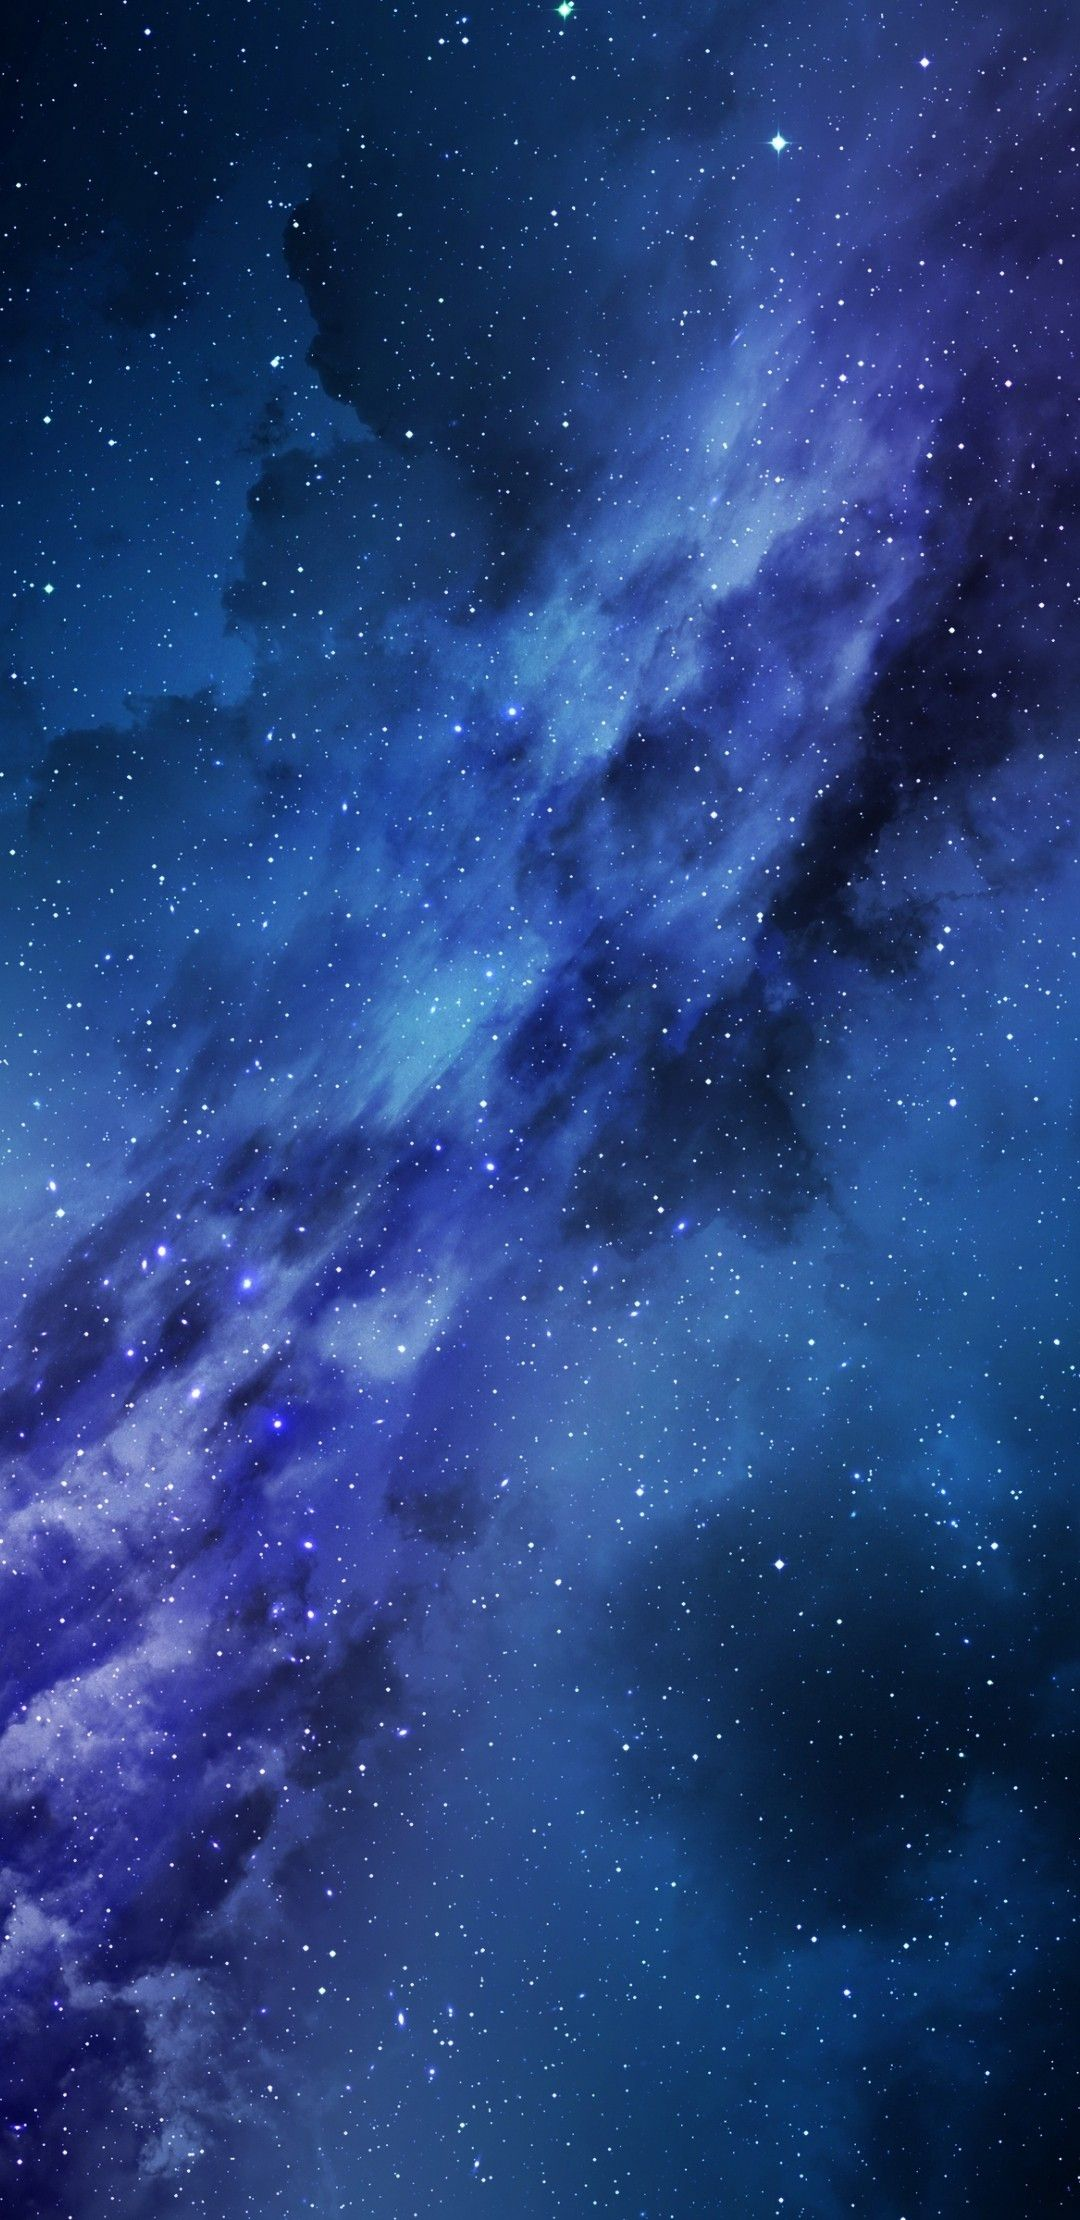 Galaxy Blue Galaxy Wallpaper Galaxy Wallpaper Star Background Galaxy blue wallpaper for phone